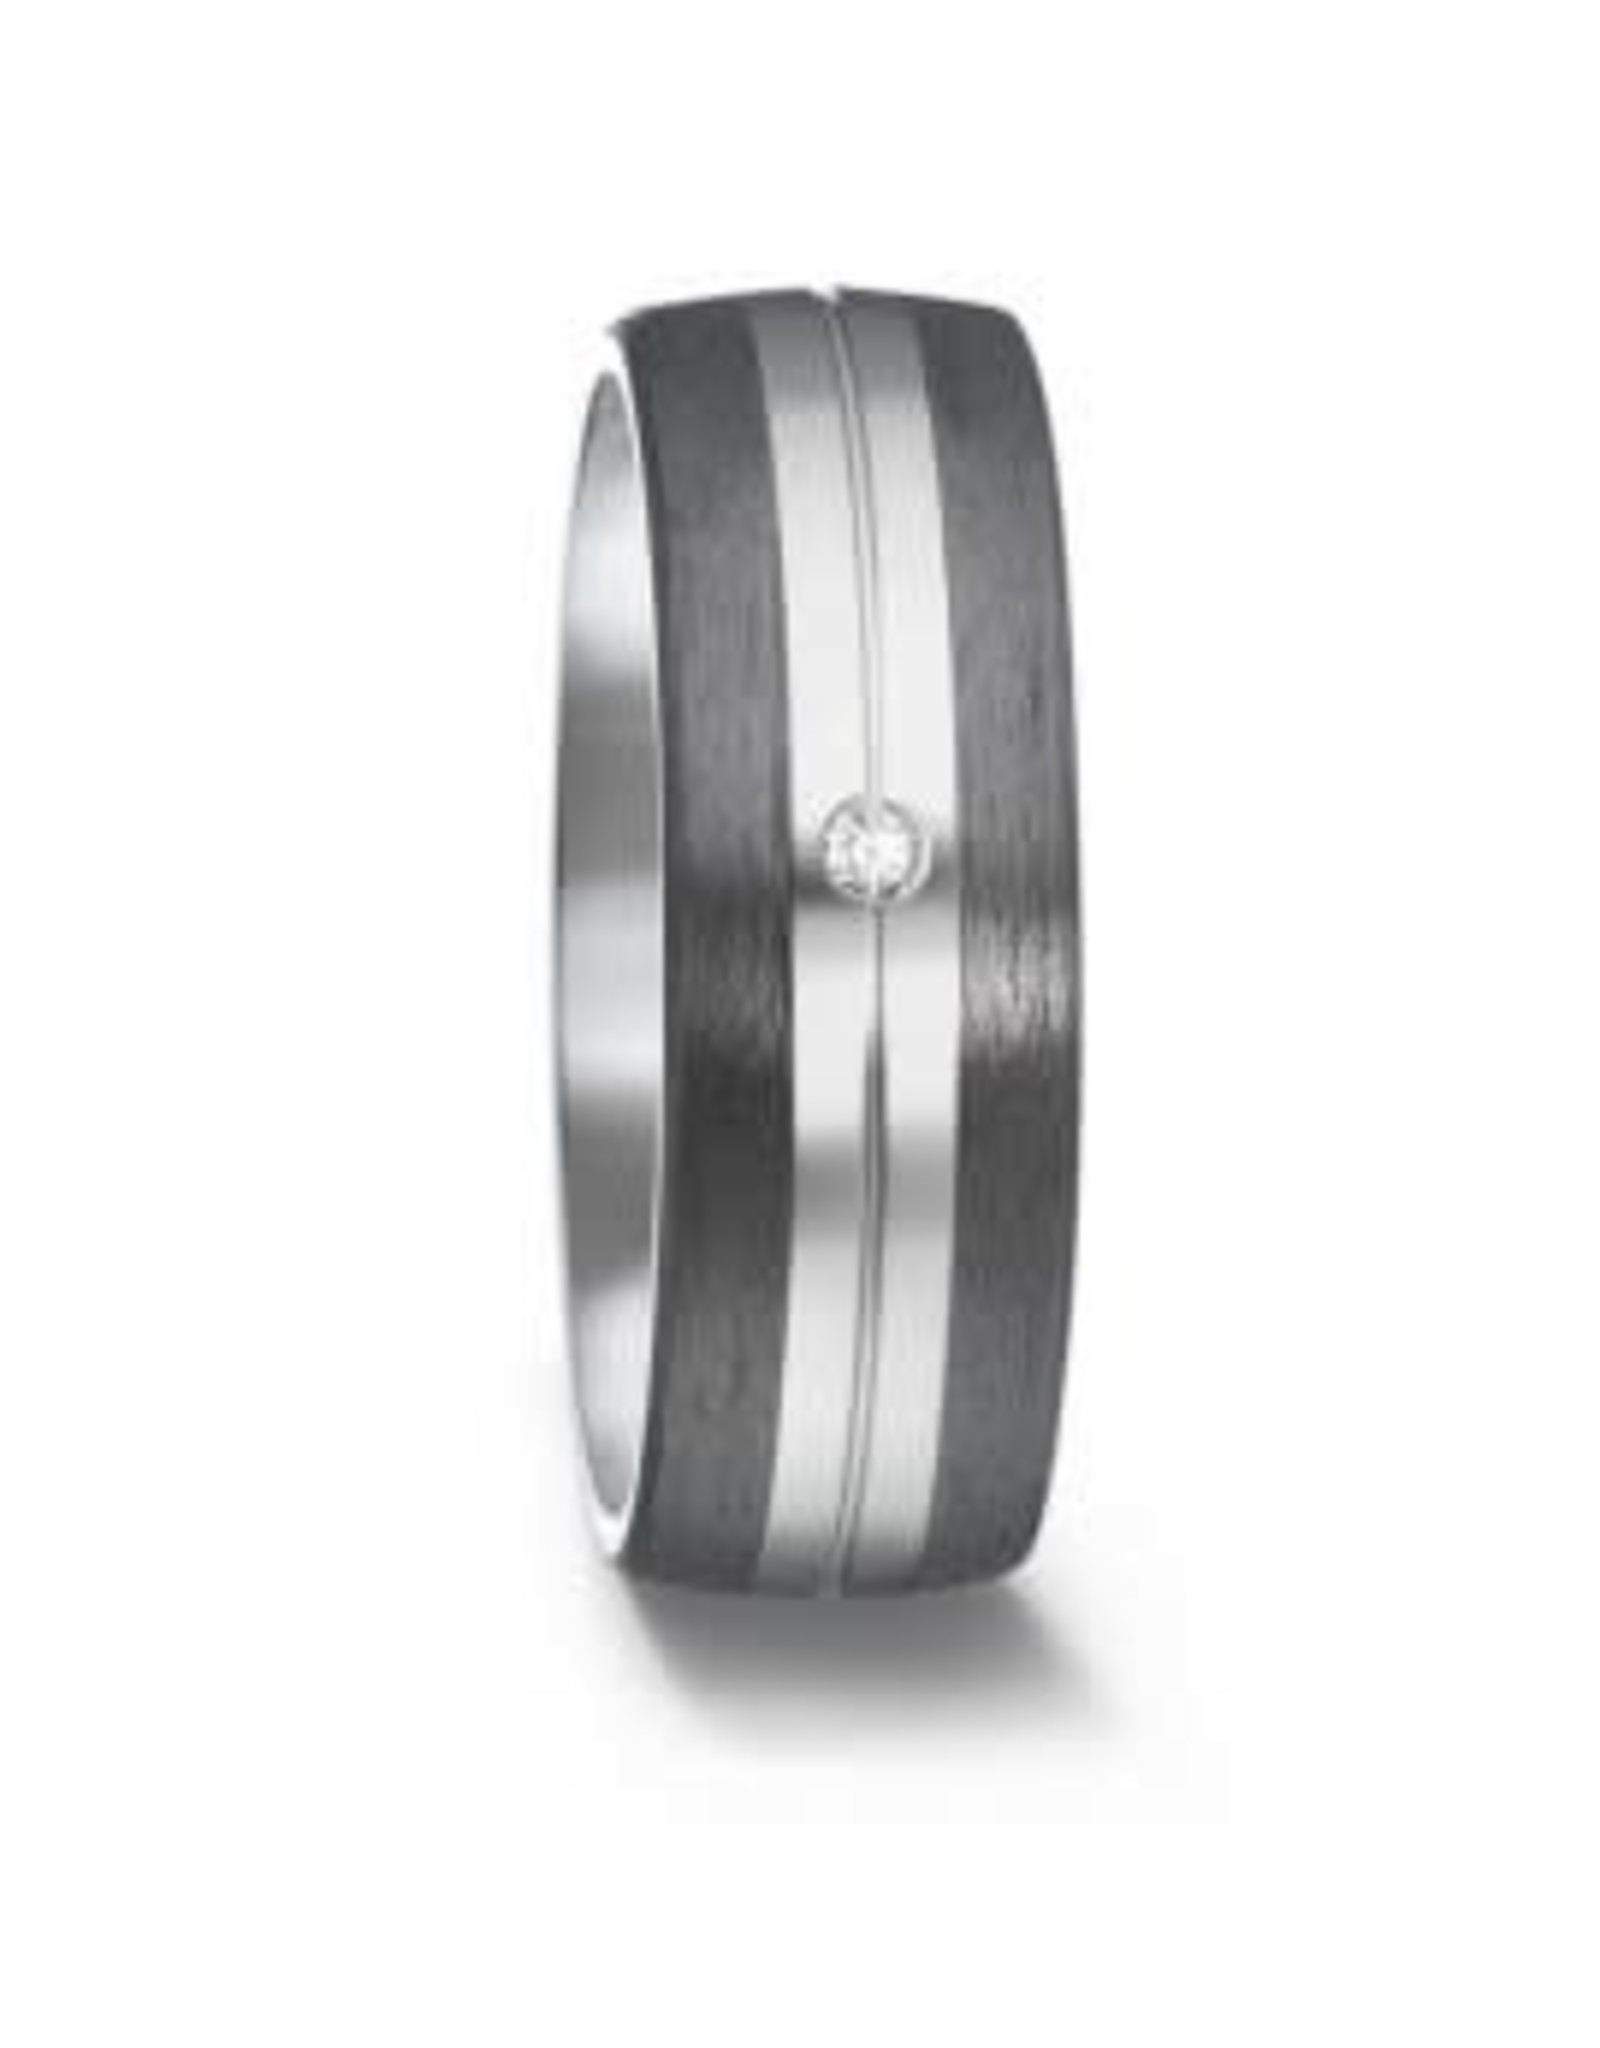 Titan Factory Ring Titan Factory Titanium TF/52474/000/003/20 5mm or 7 mm maat 54